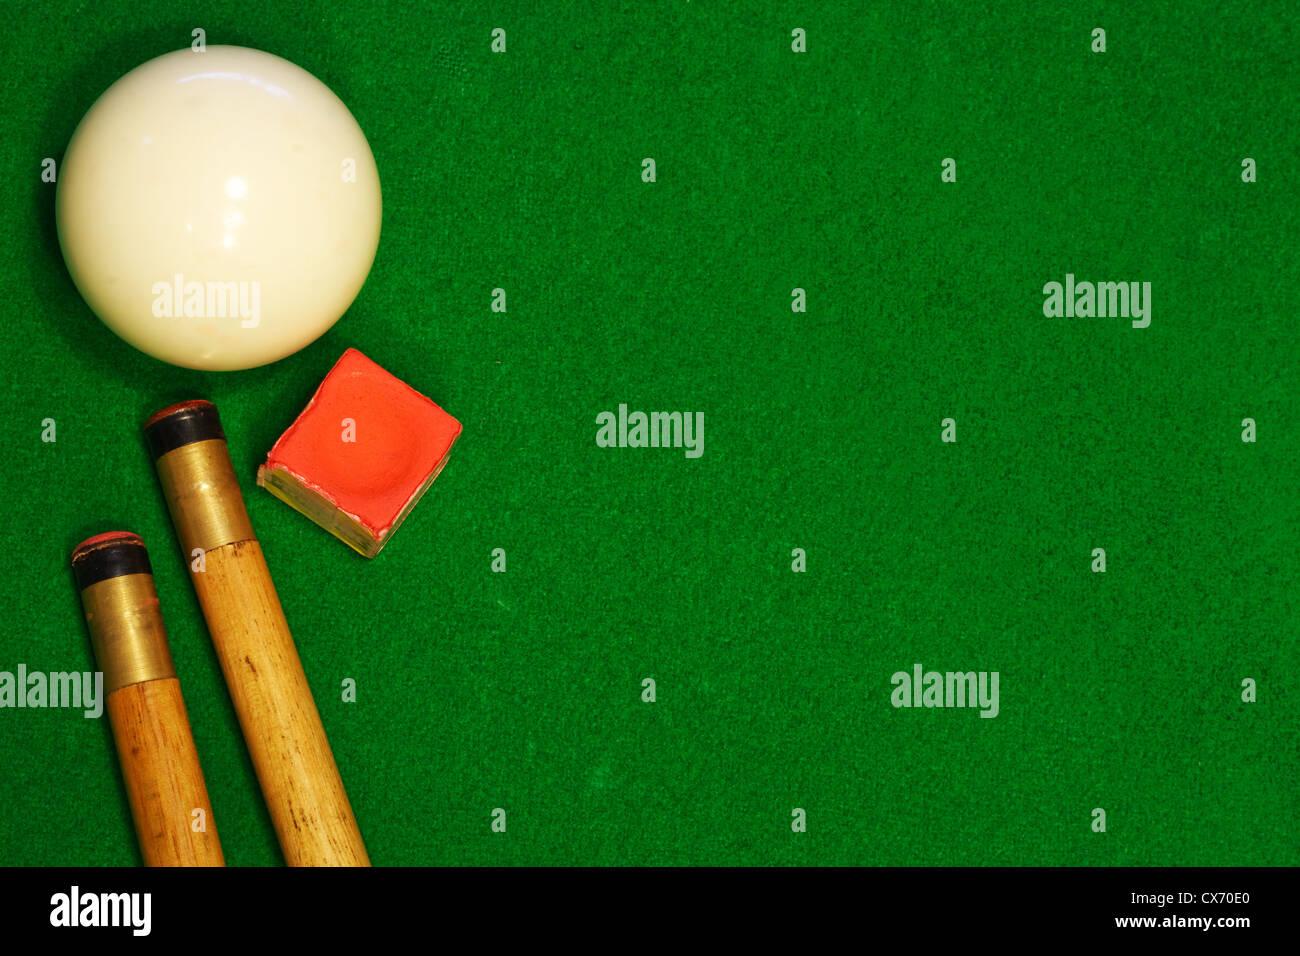 Un tissu vert billard table de billard ou d'arrière-plan avec des duc, et Chalk cueball Photo Stock